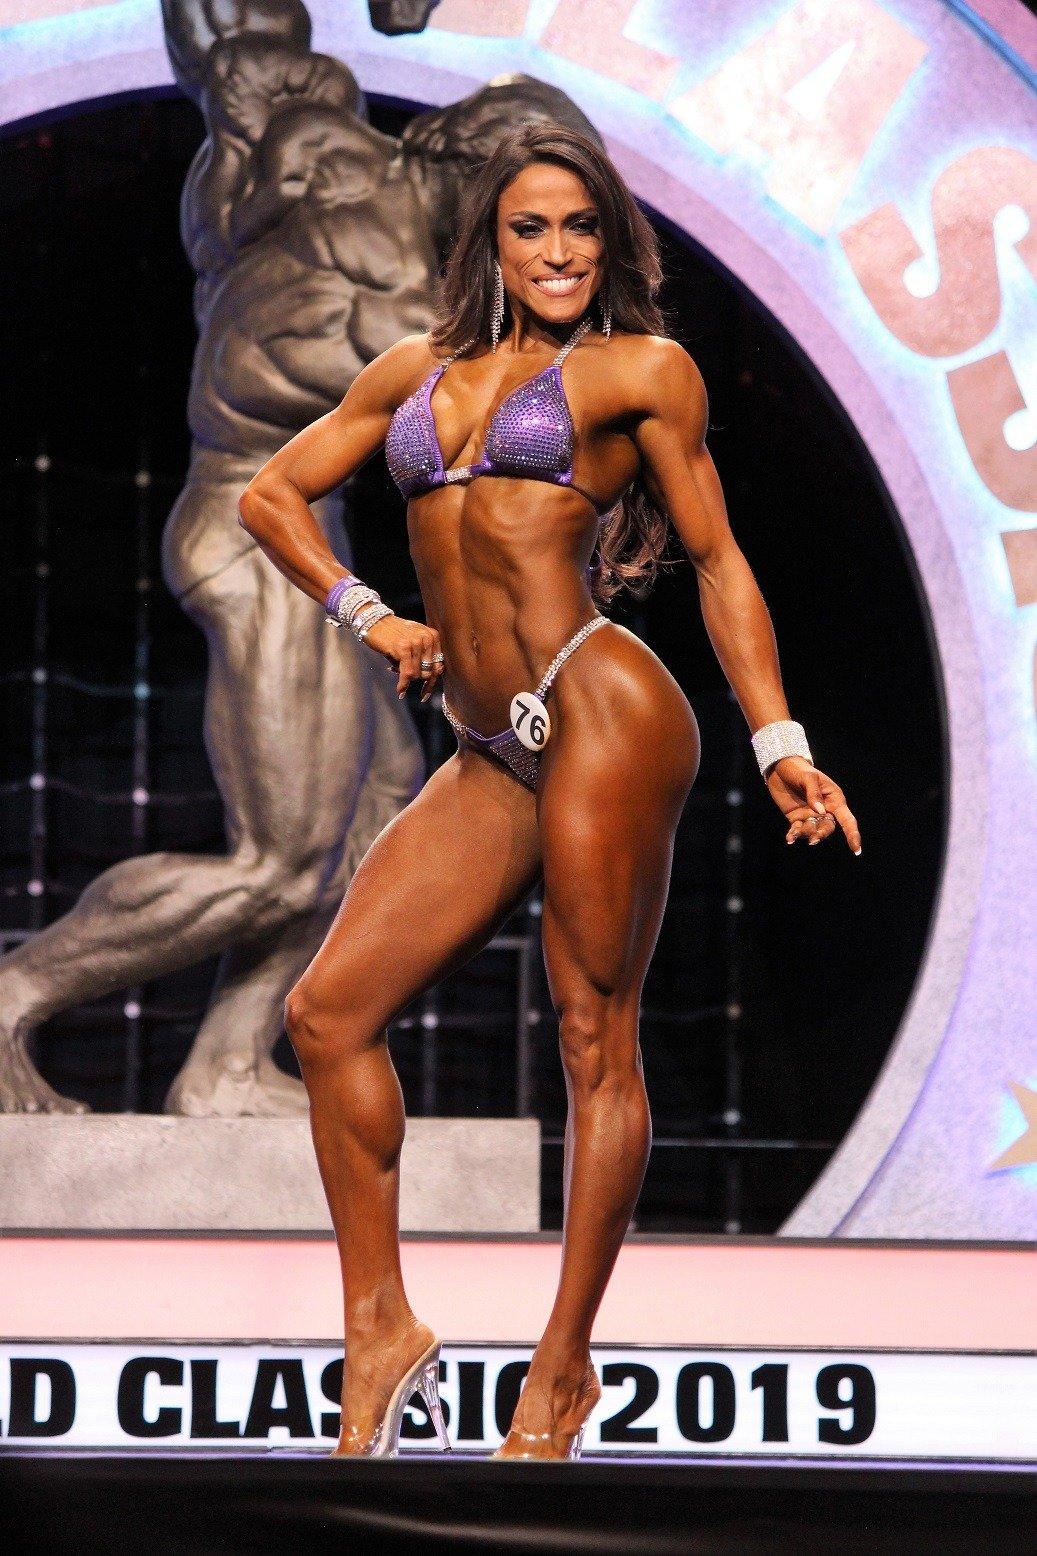 Arnold amateur npc bikini championship — 5